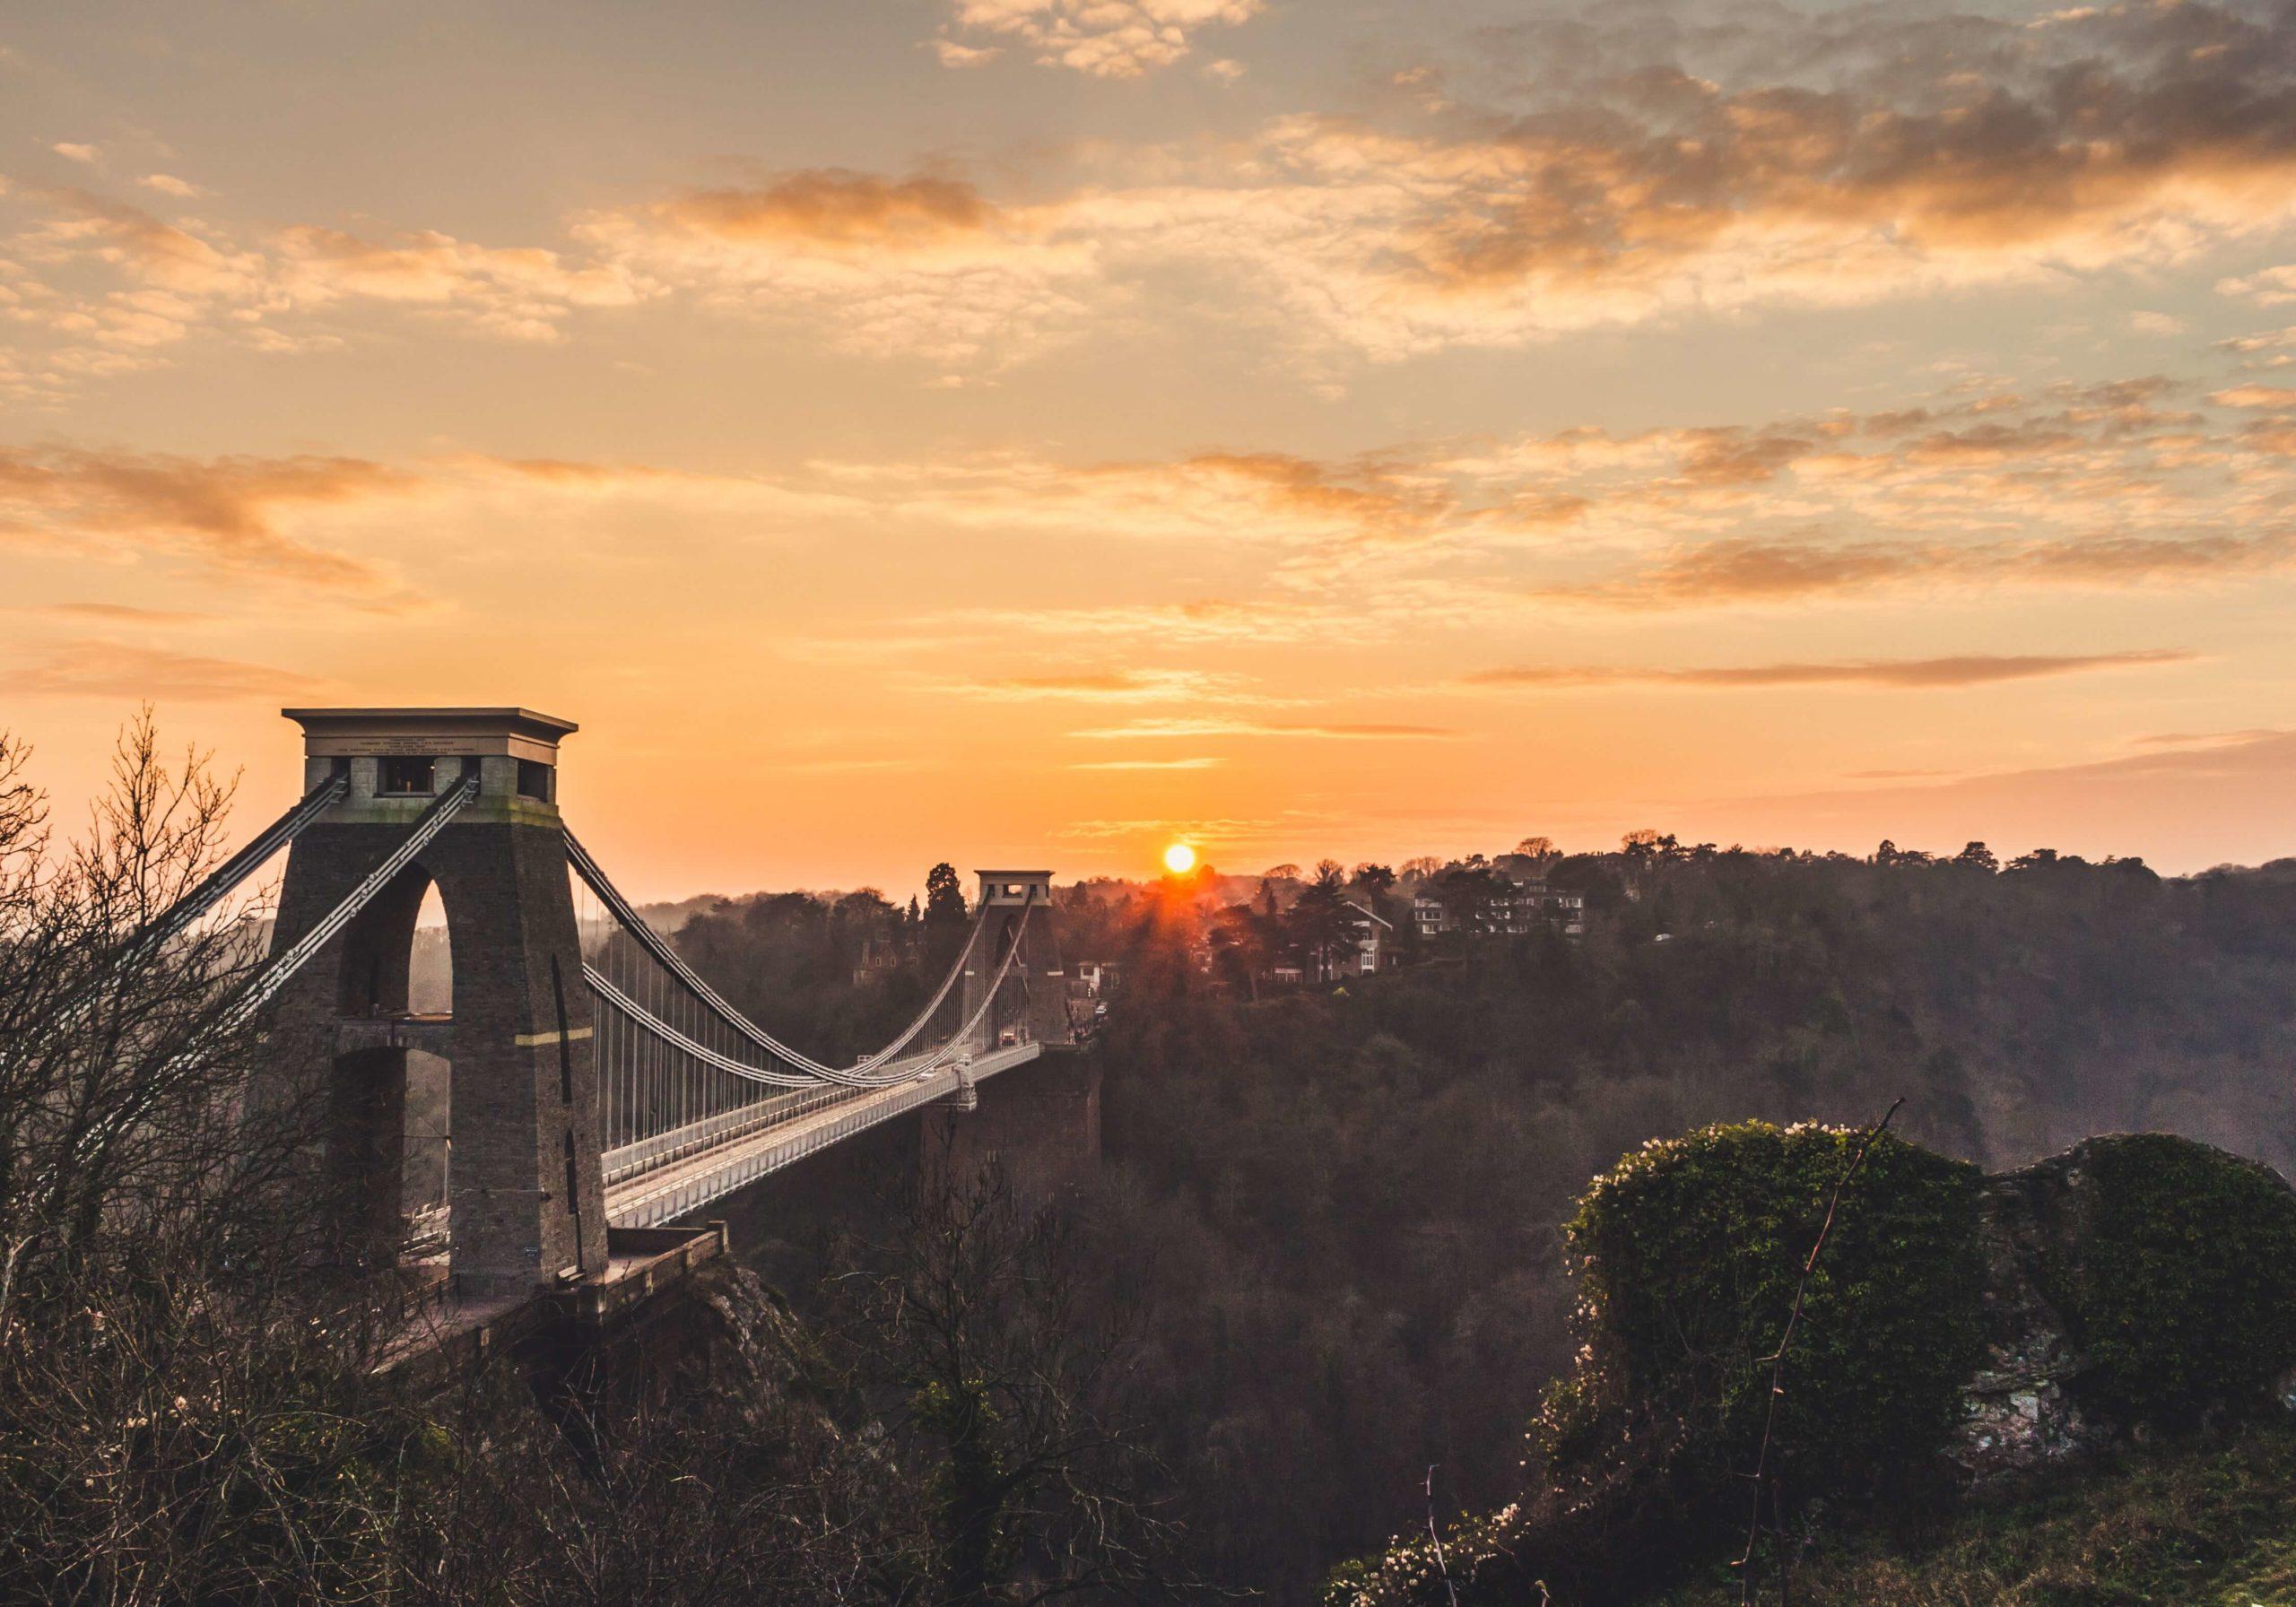 CoolBison seo Bristol were established as a digital marketing agency in July 2015